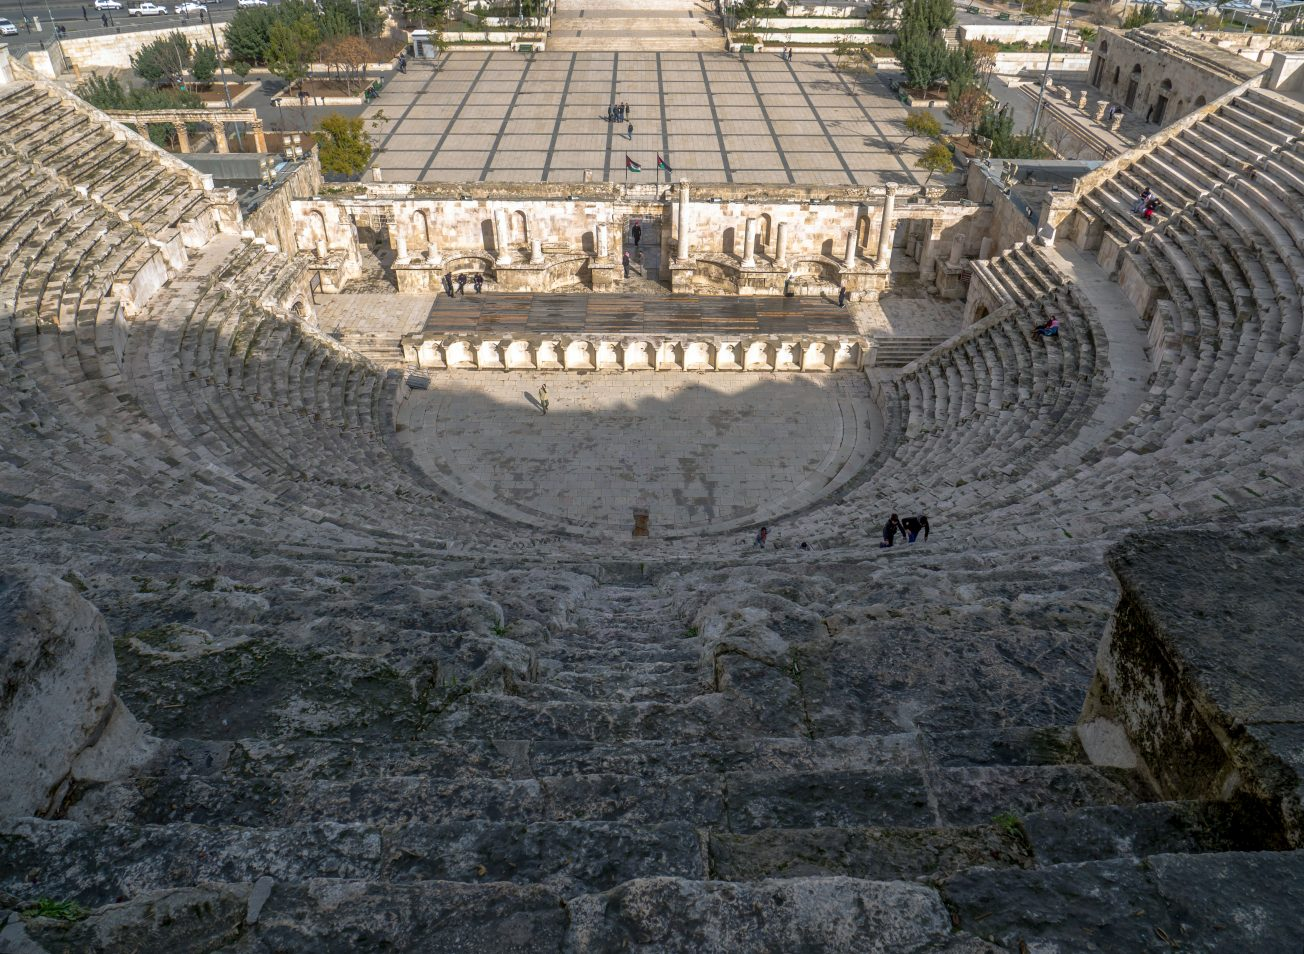 Rímsky amfiteáter v Amáne